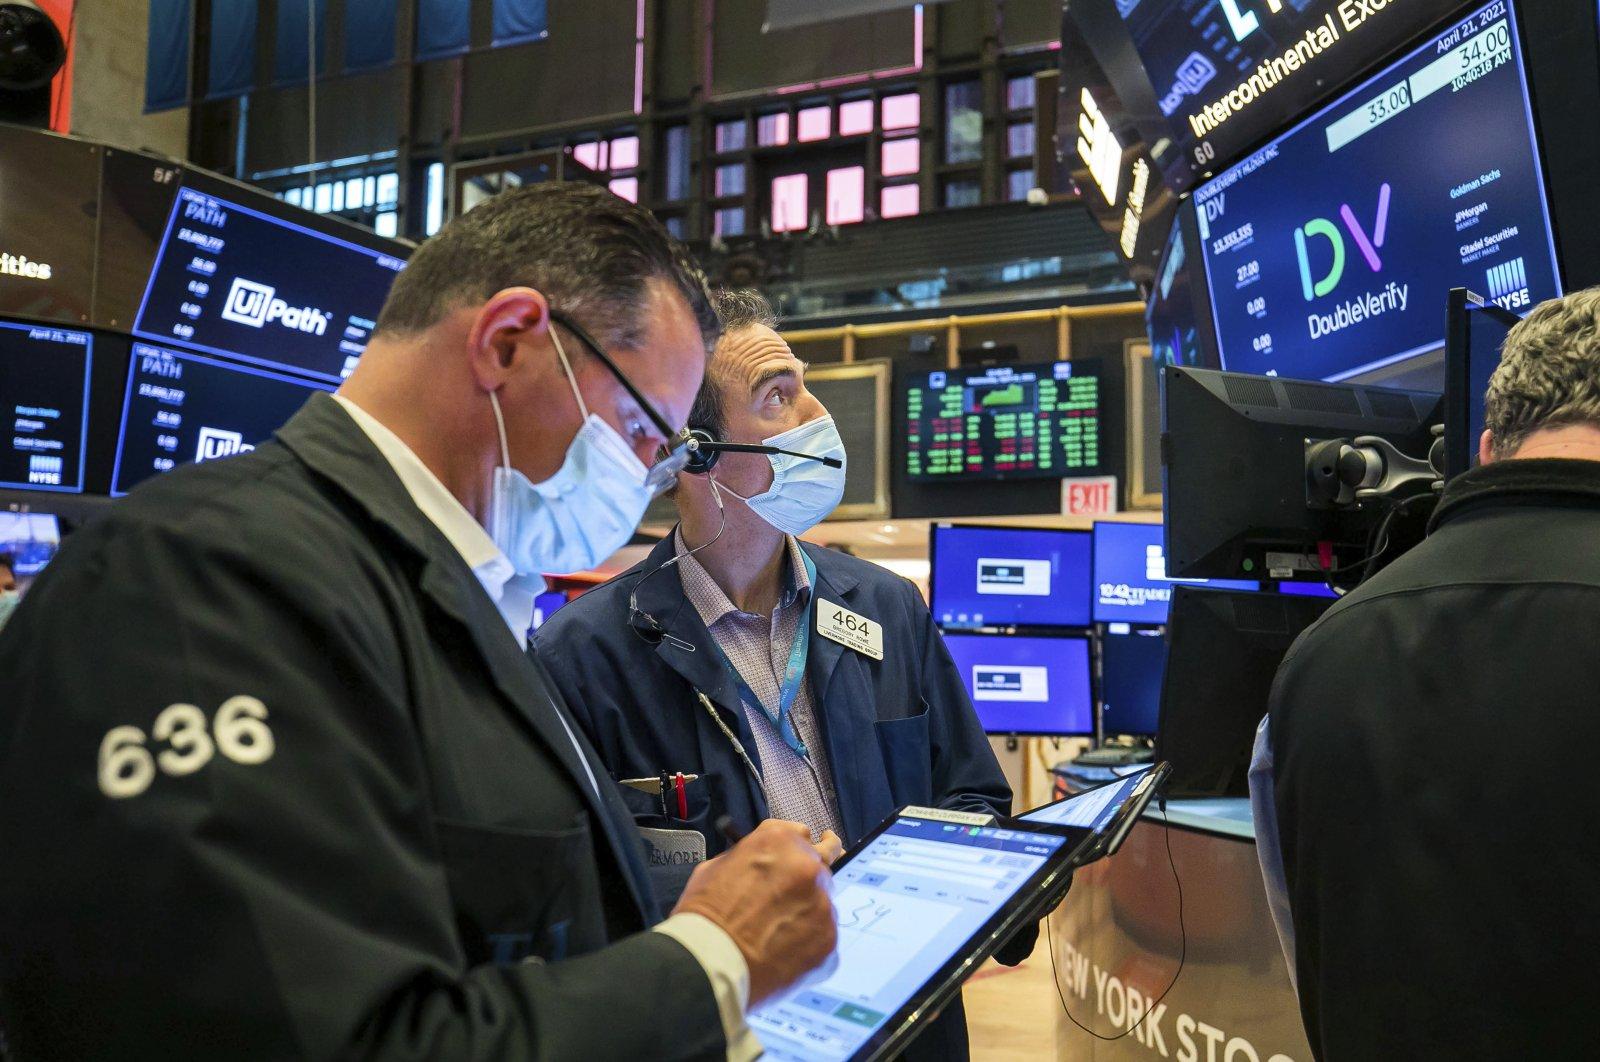 Traders work on the floor of the New York Stock Exchange, New York, U.S., April 21, 2021 (Courtney Crow/New York Stock Exchange via AP)